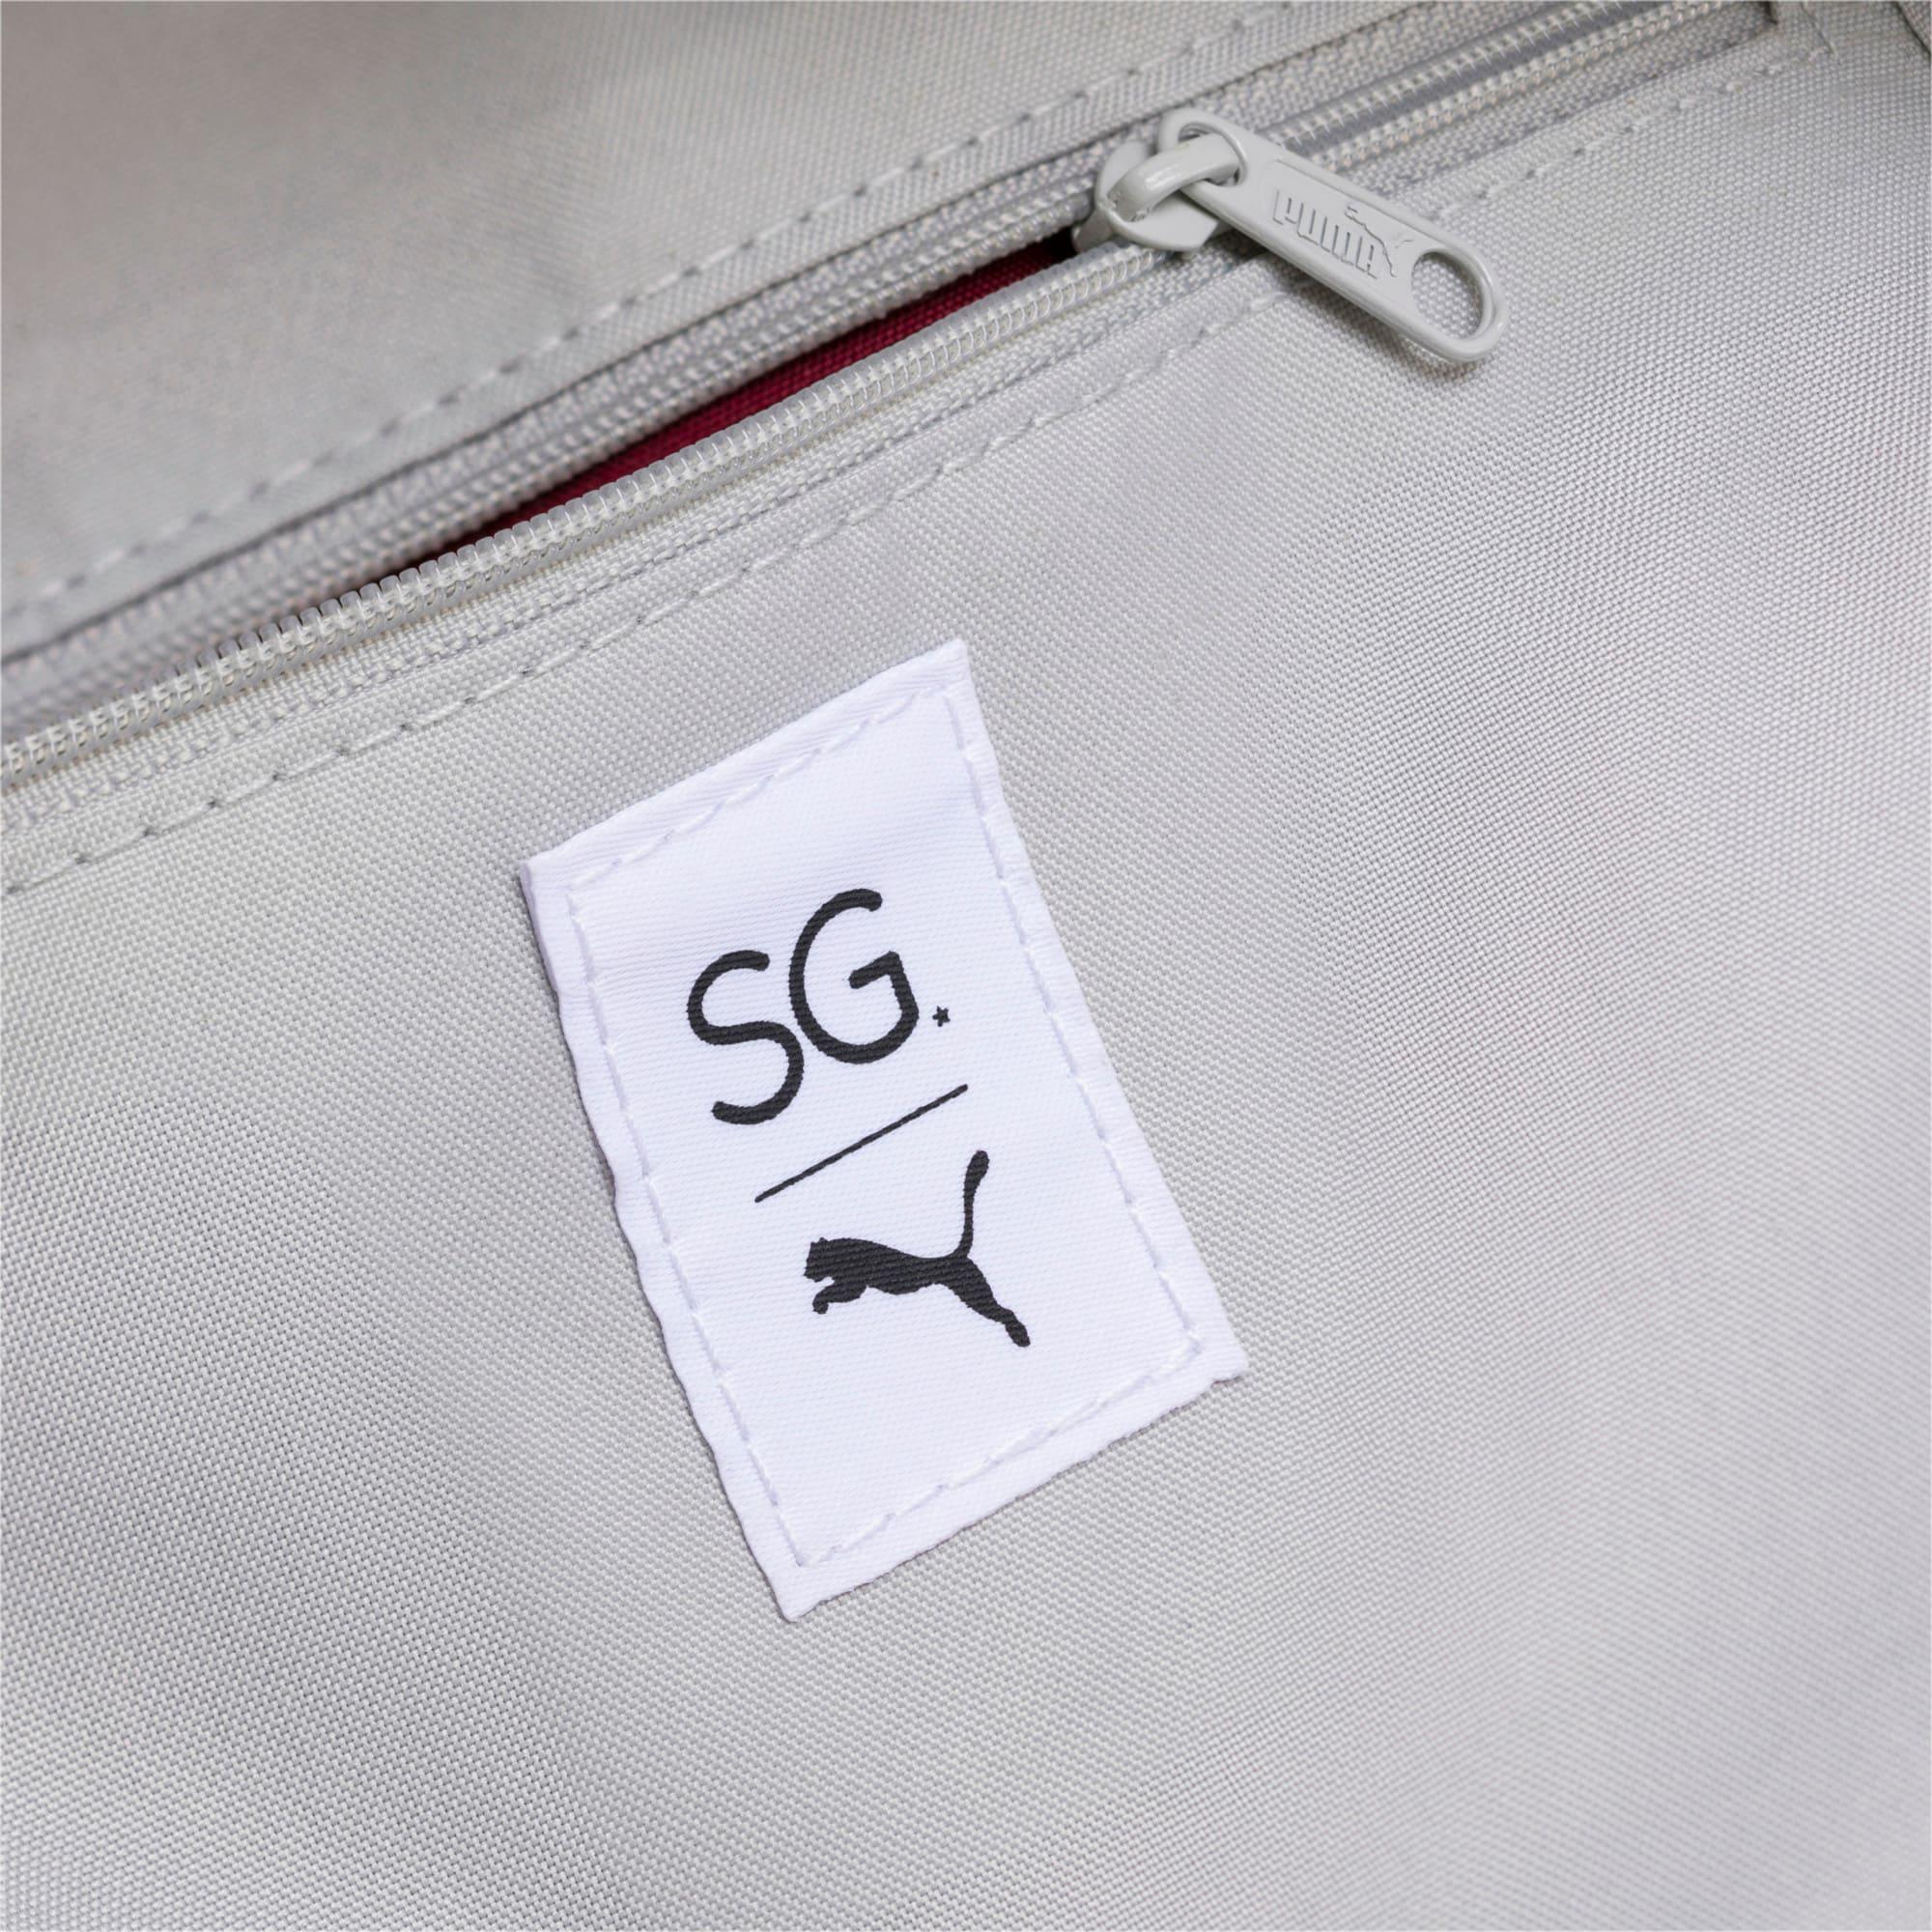 Thumbnail 4 of SG x PUMA Style Backpack, Puma White, medium